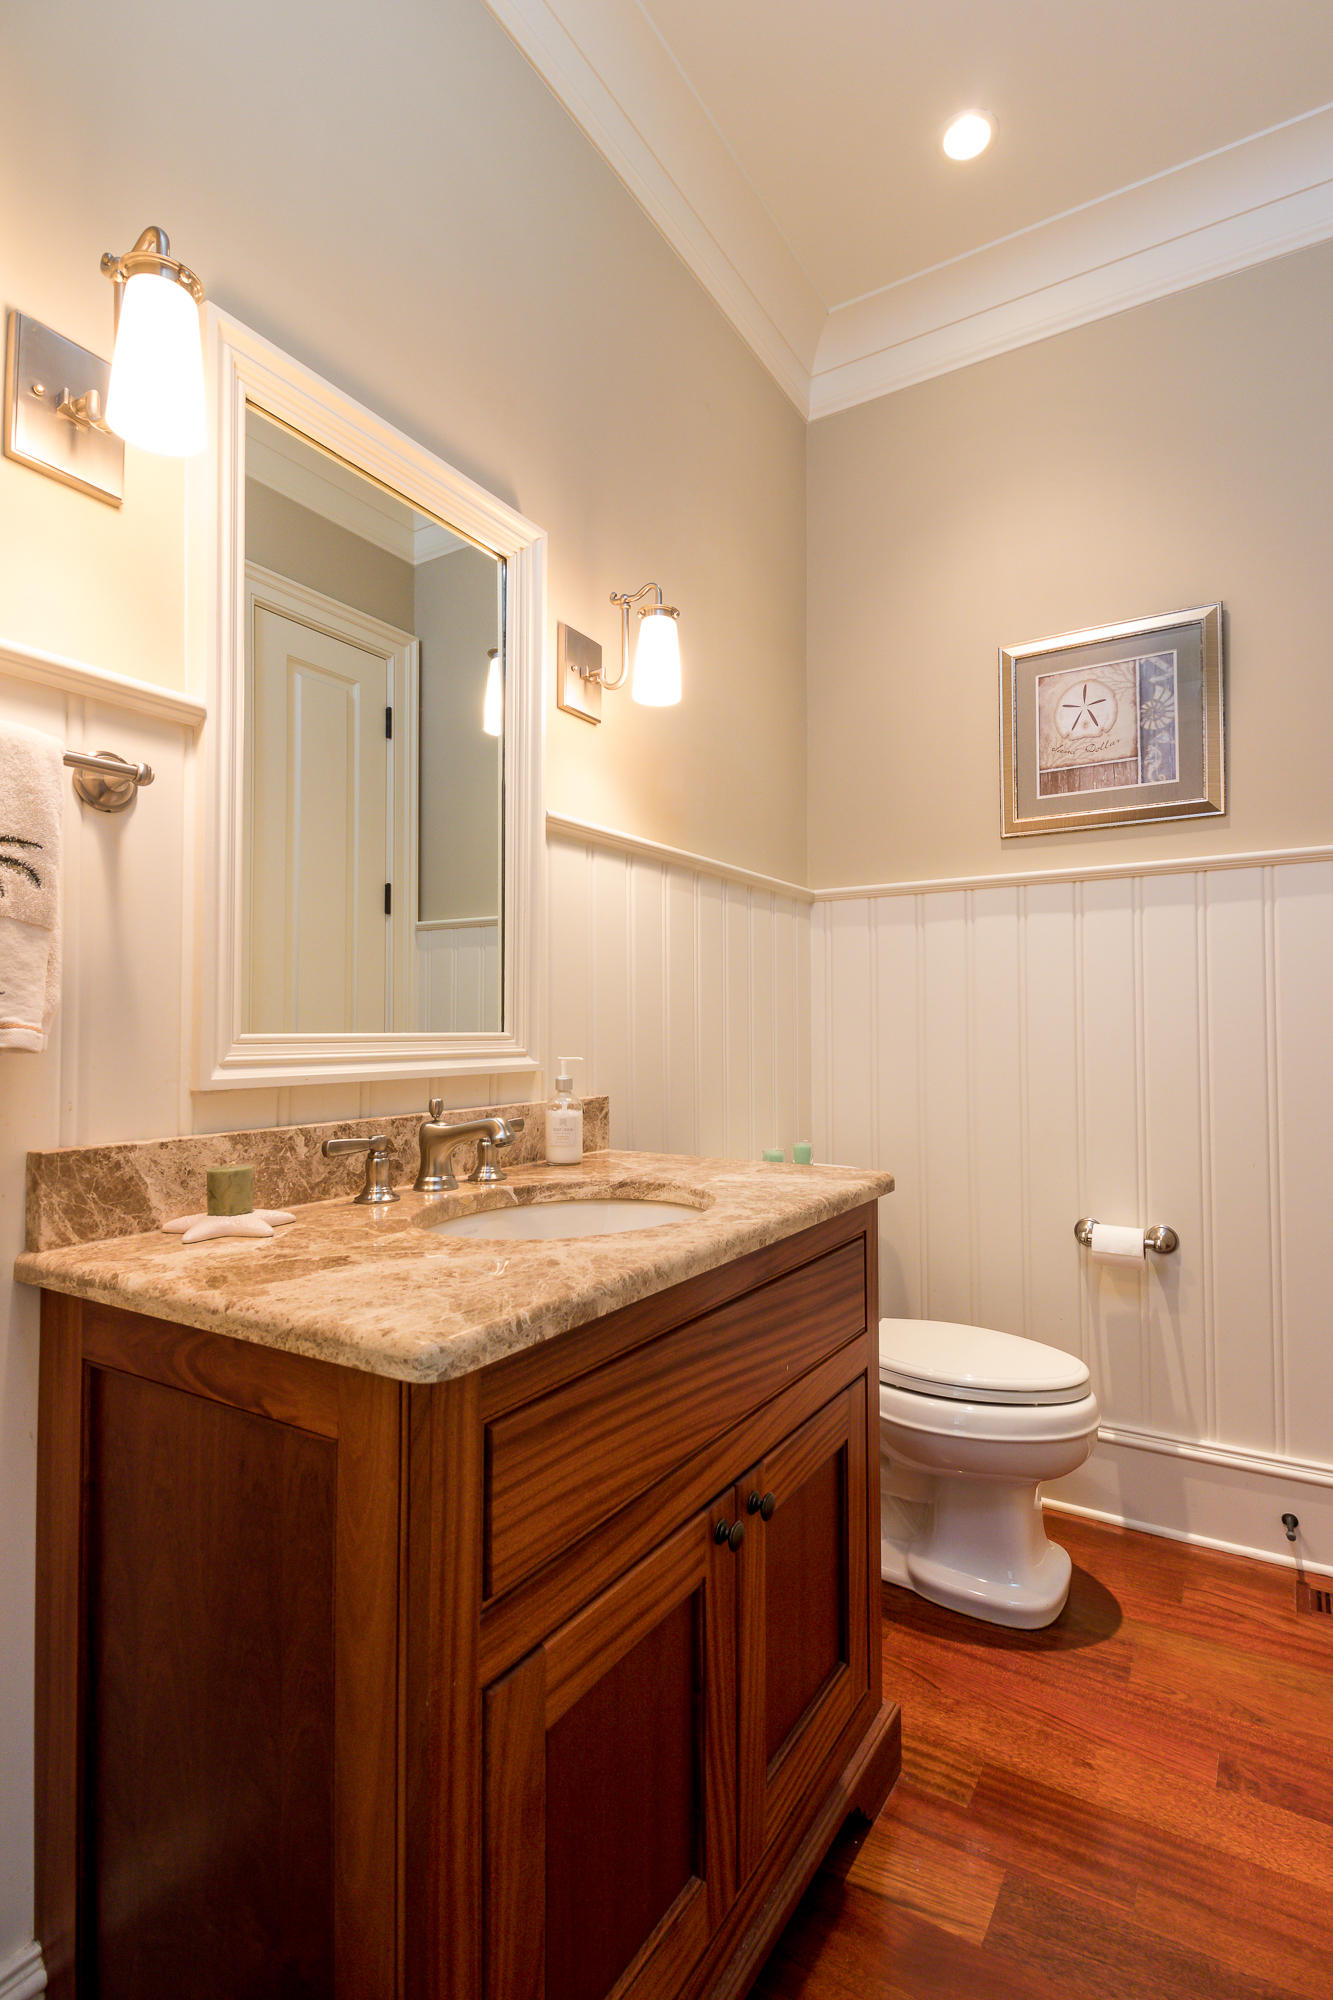 Egret/Pintail Homes For Sale - 117 Bufflehead, Kiawah Island, SC - 34